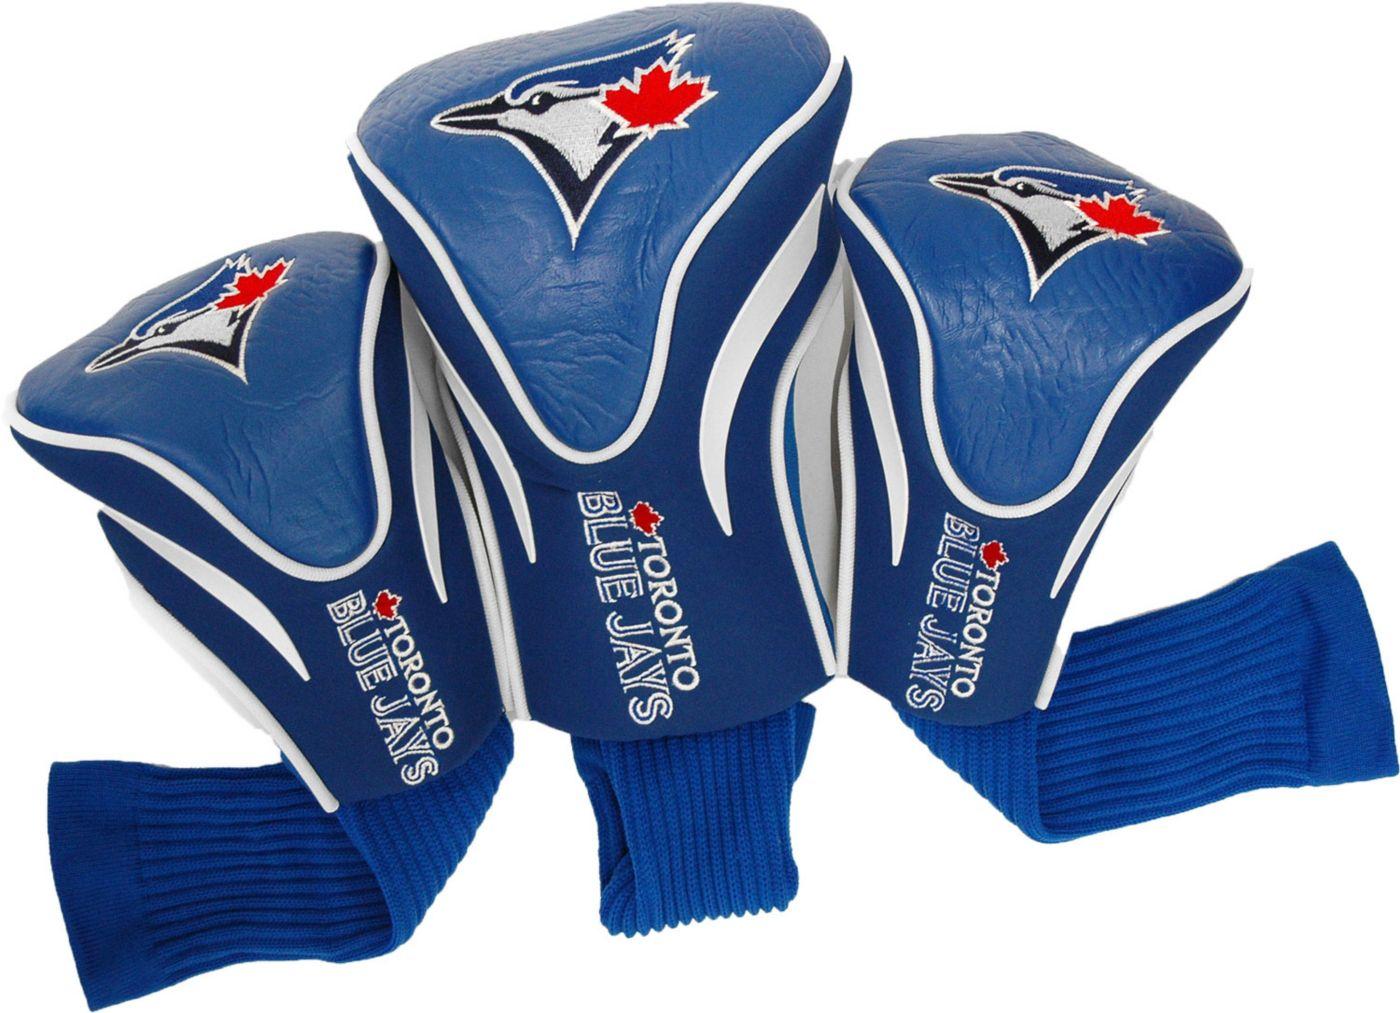 Team Golf Toronto Blue Jays Contoured Headcovers - 3-Pack